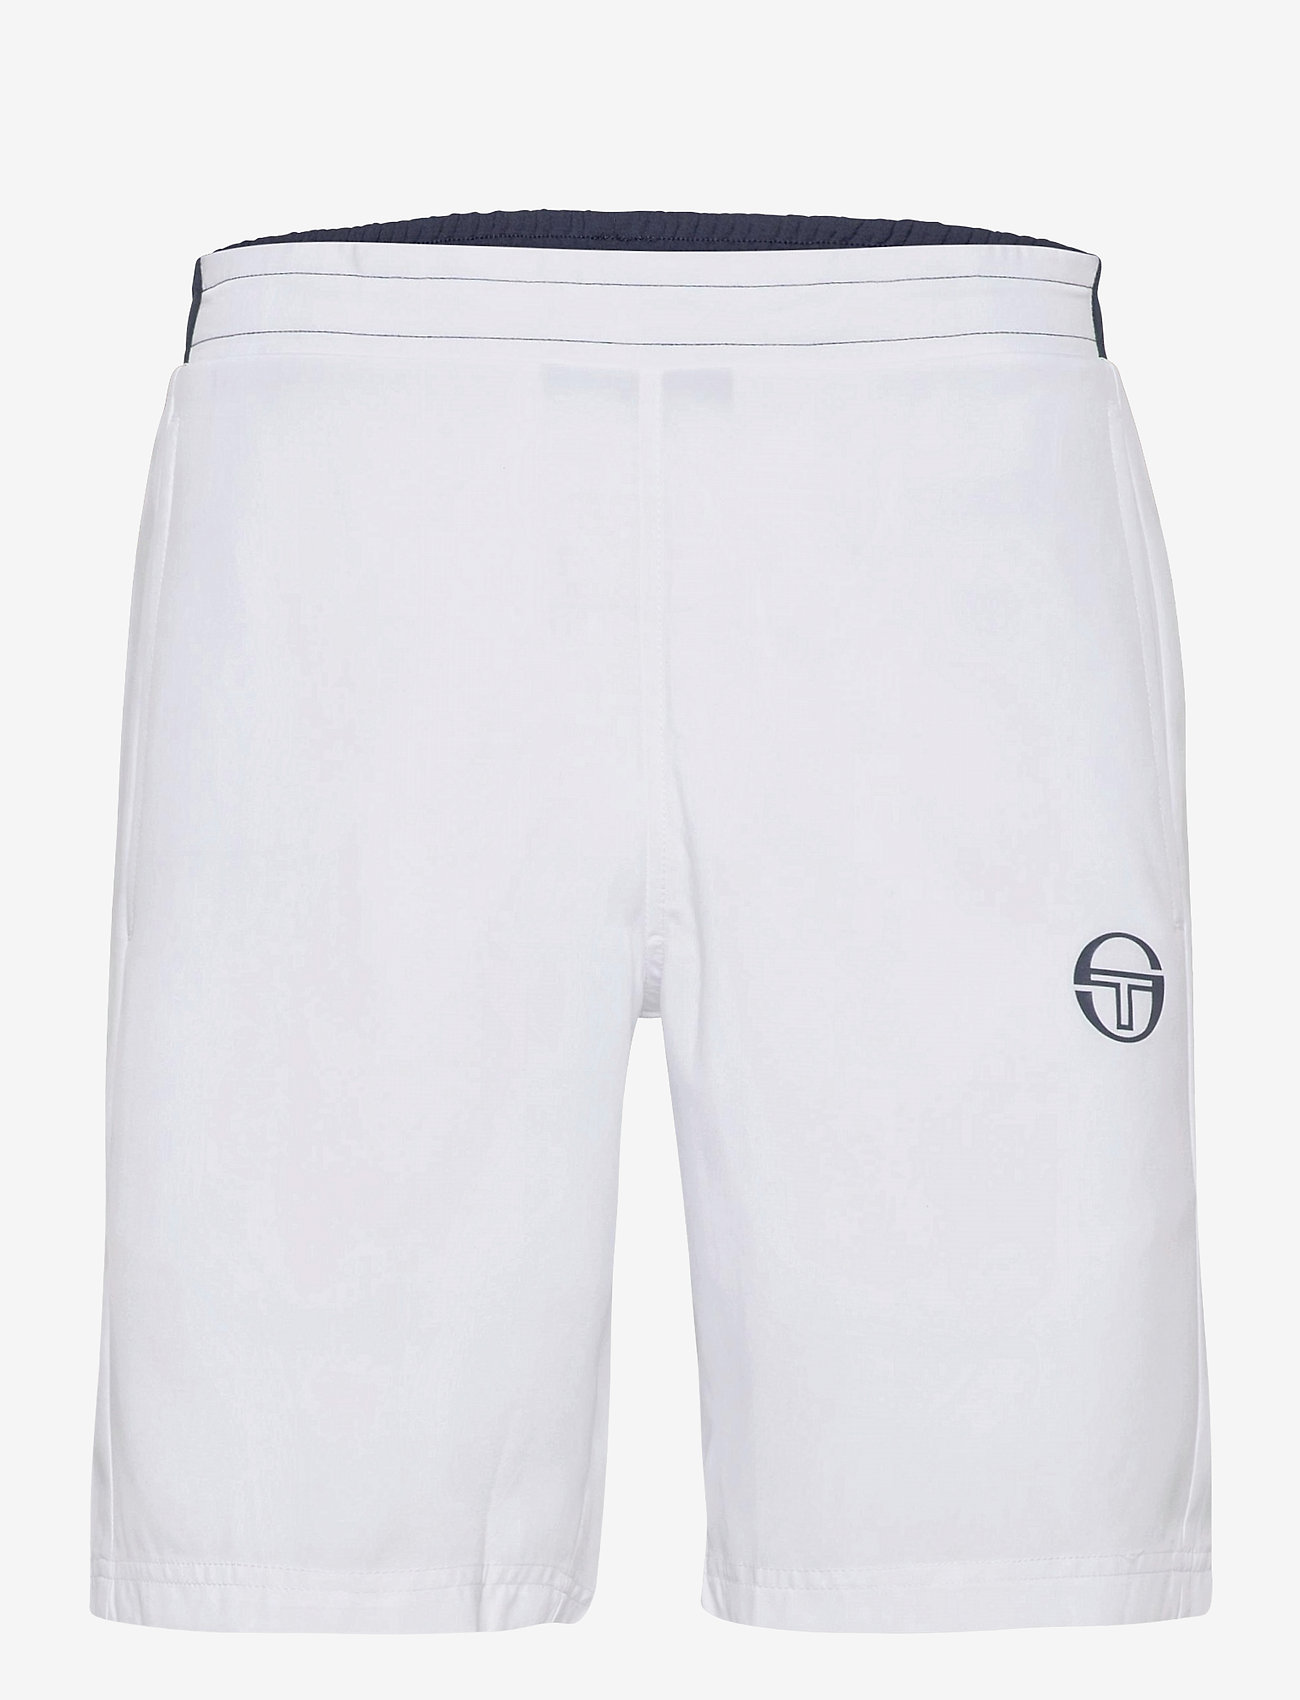 Sergio Tacchini - CLUB TECH SHORTS - training korte broek - white/navy - 0